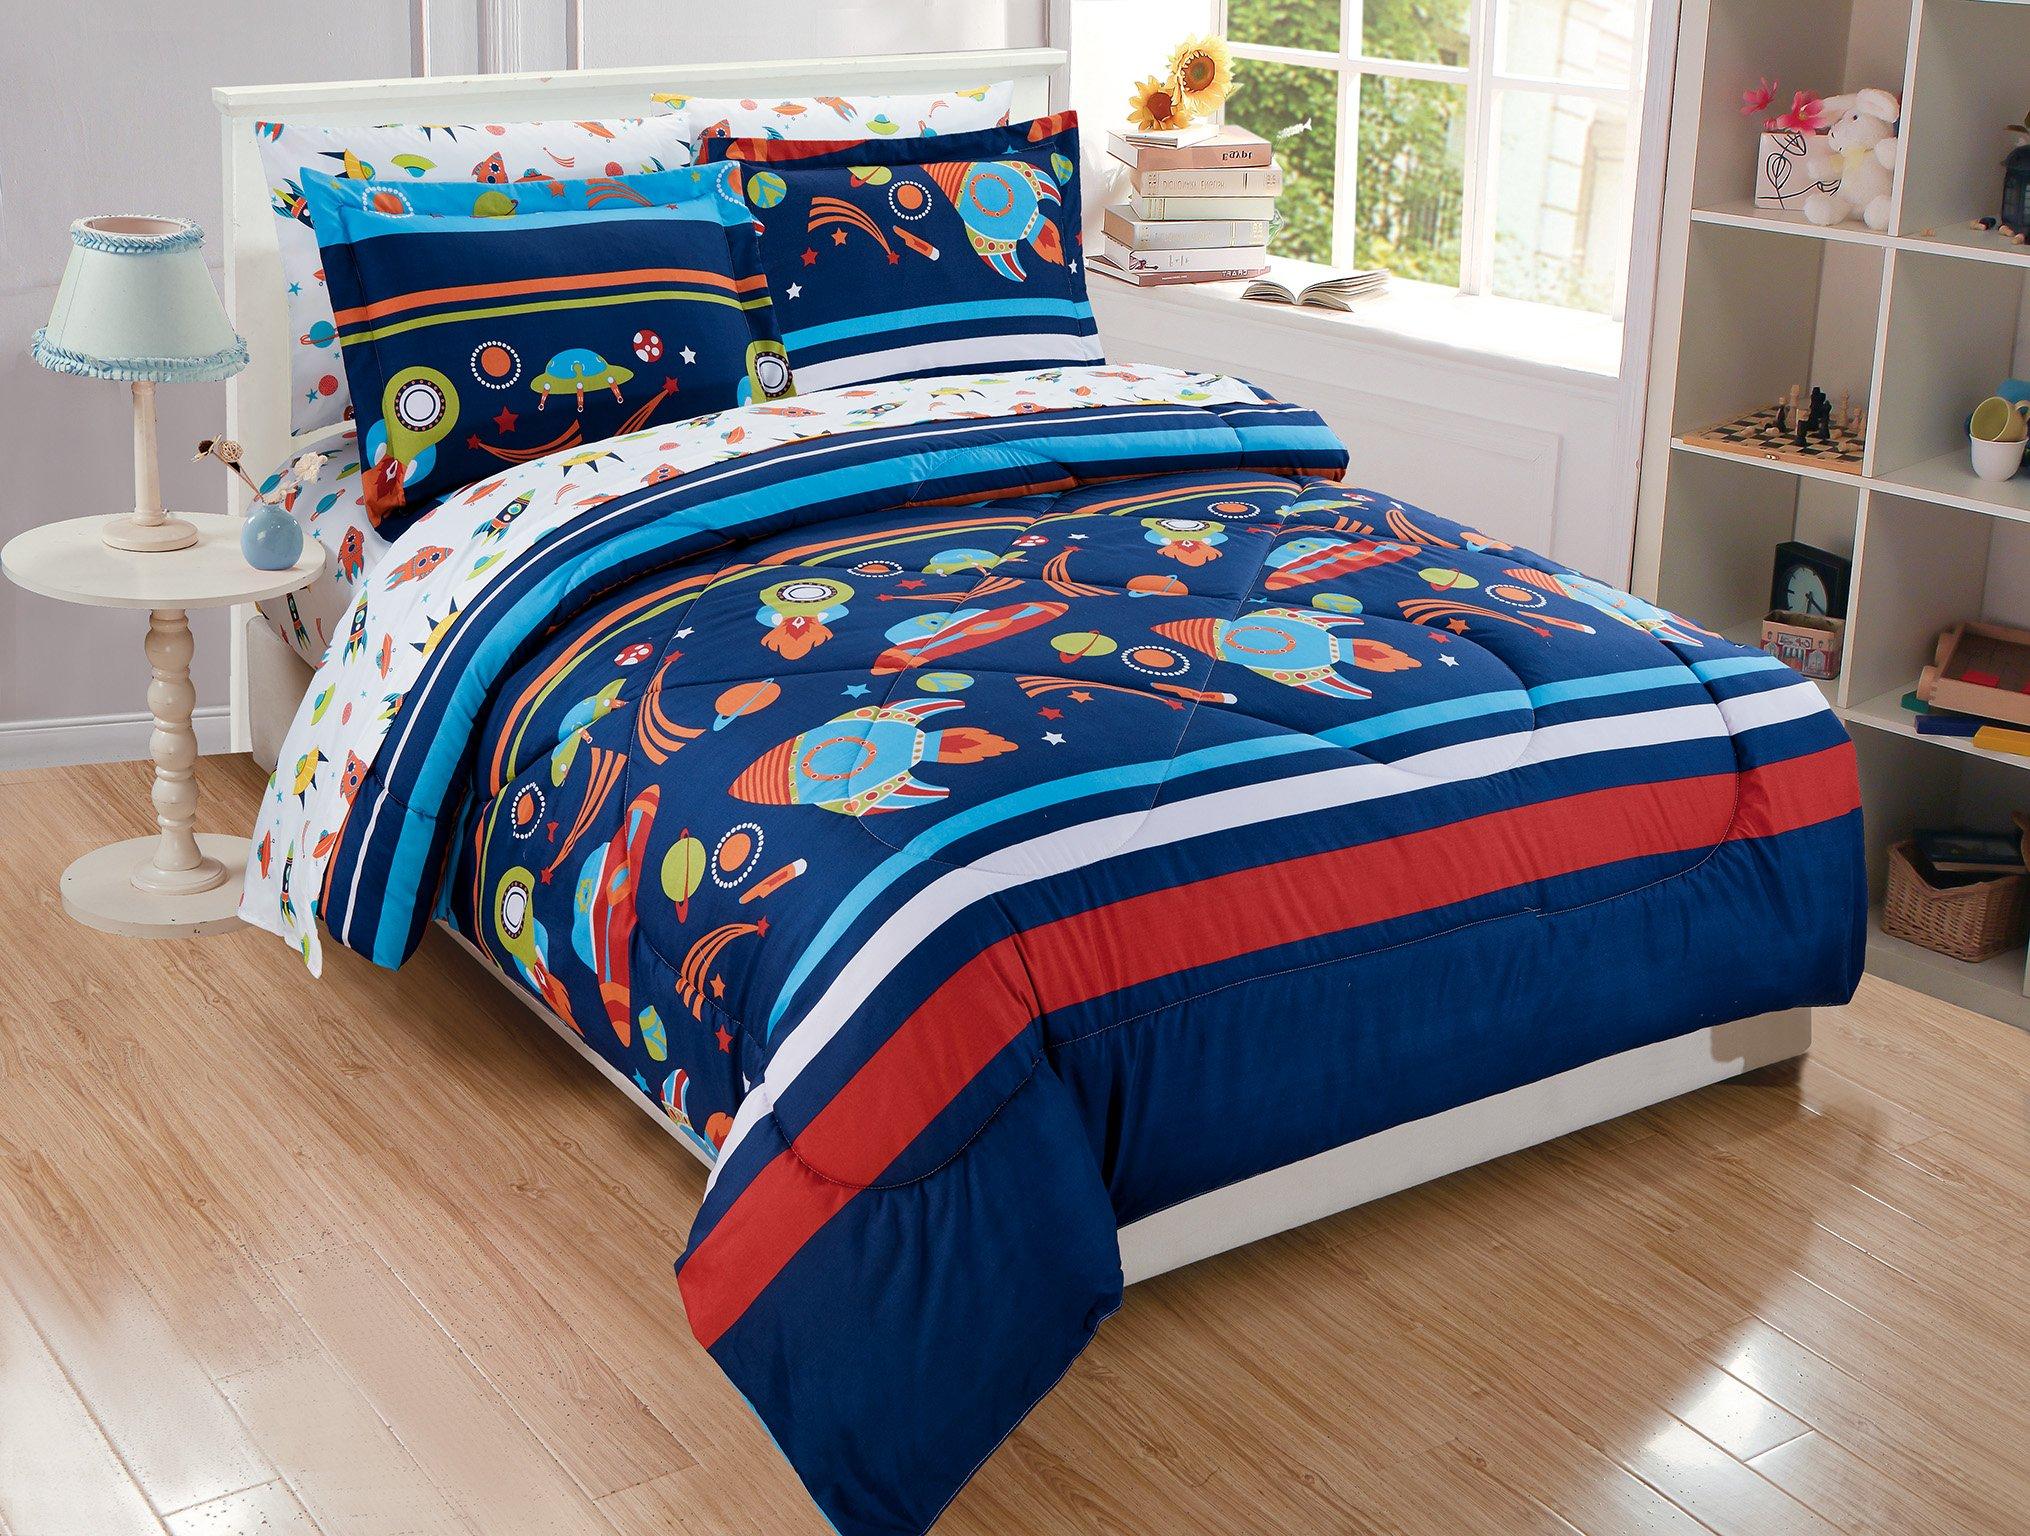 Micasa Kids Comforter Set Solar System Design (Full)